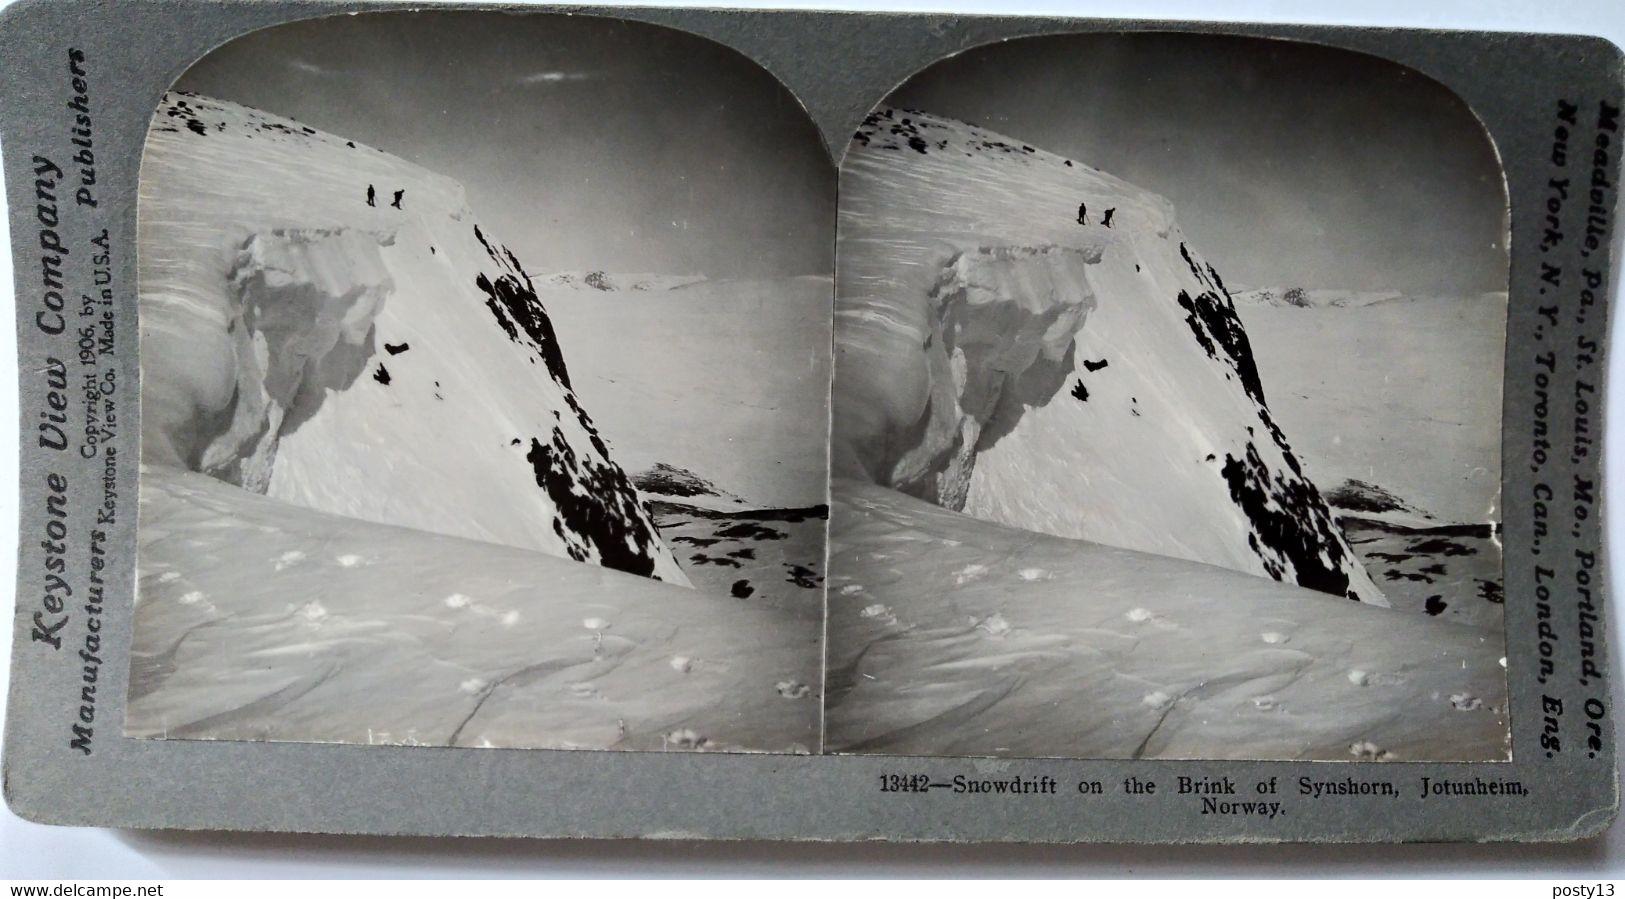 PHOTO STÉRÉO NORVÈGE - Superbe Stéréoscopique Neige Et Glace - Jotuheim - - 1906 - Ed. Keystone TBE - Stereoscopio